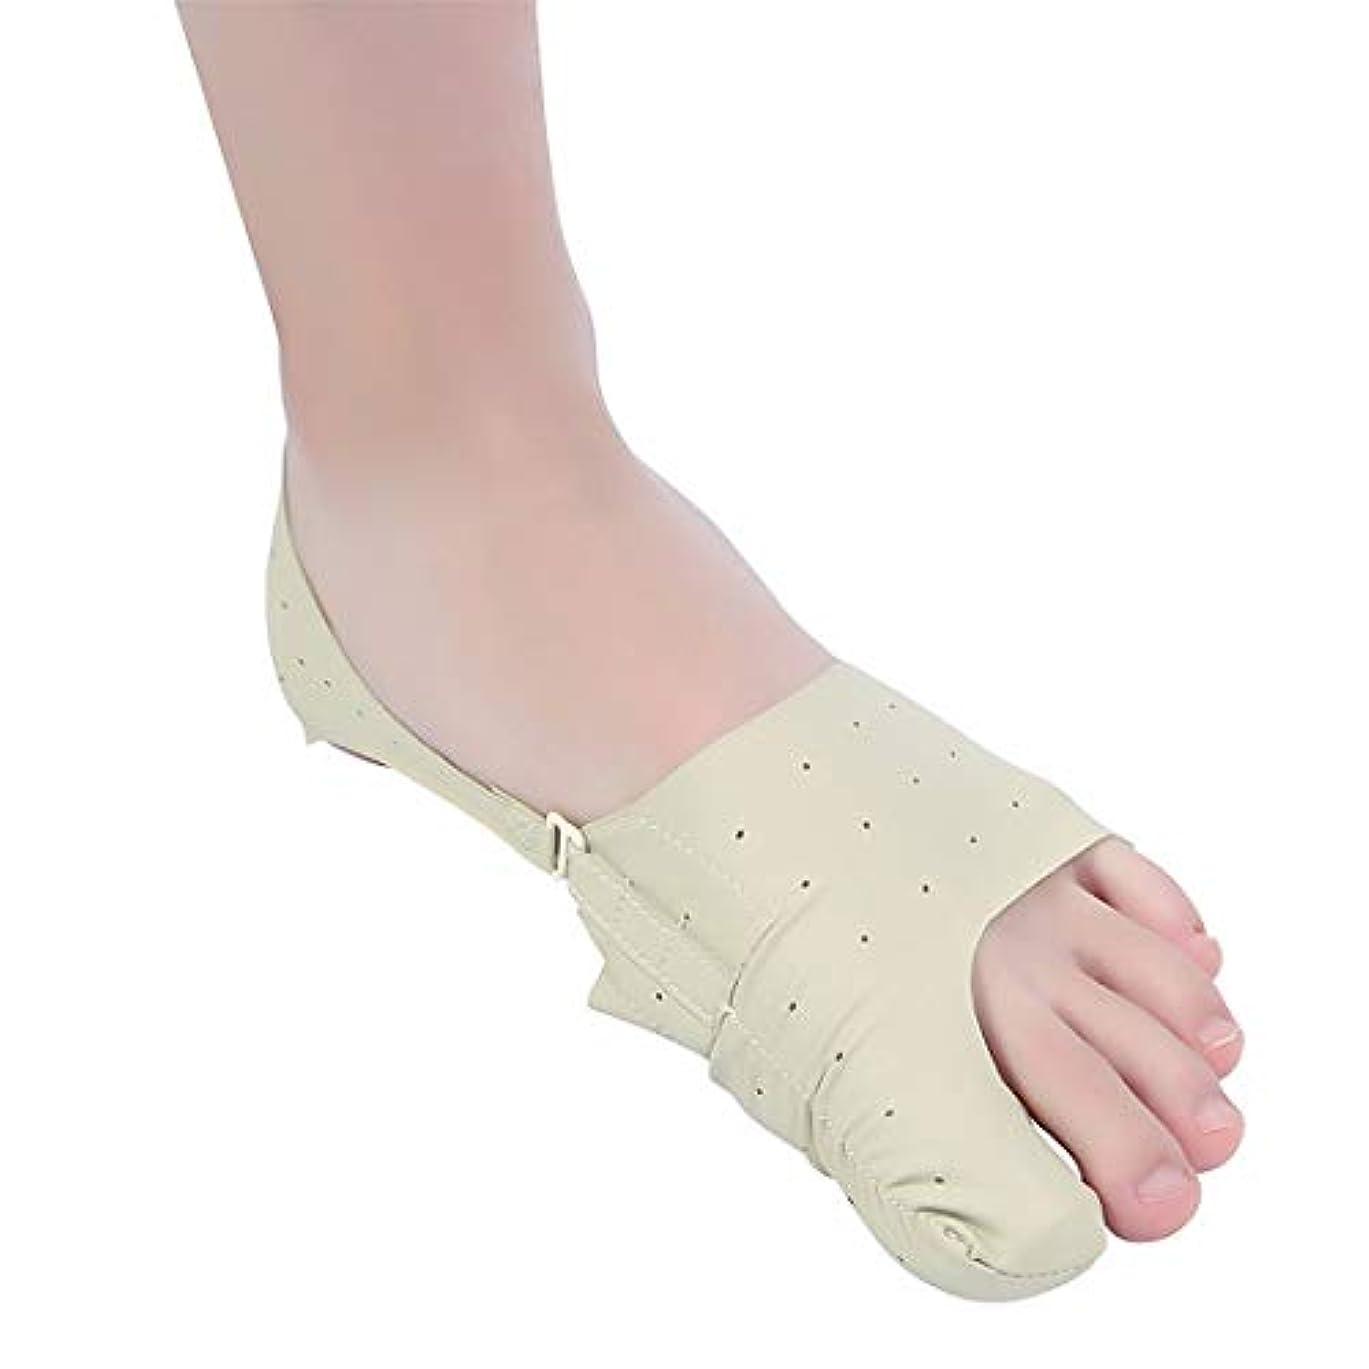 5PCS腱膜瘤矯正および腱膜瘤救済、女性および男性用の整形外科用足先矯正、デイナイトサポート、外反母Treatの治療および予防,M